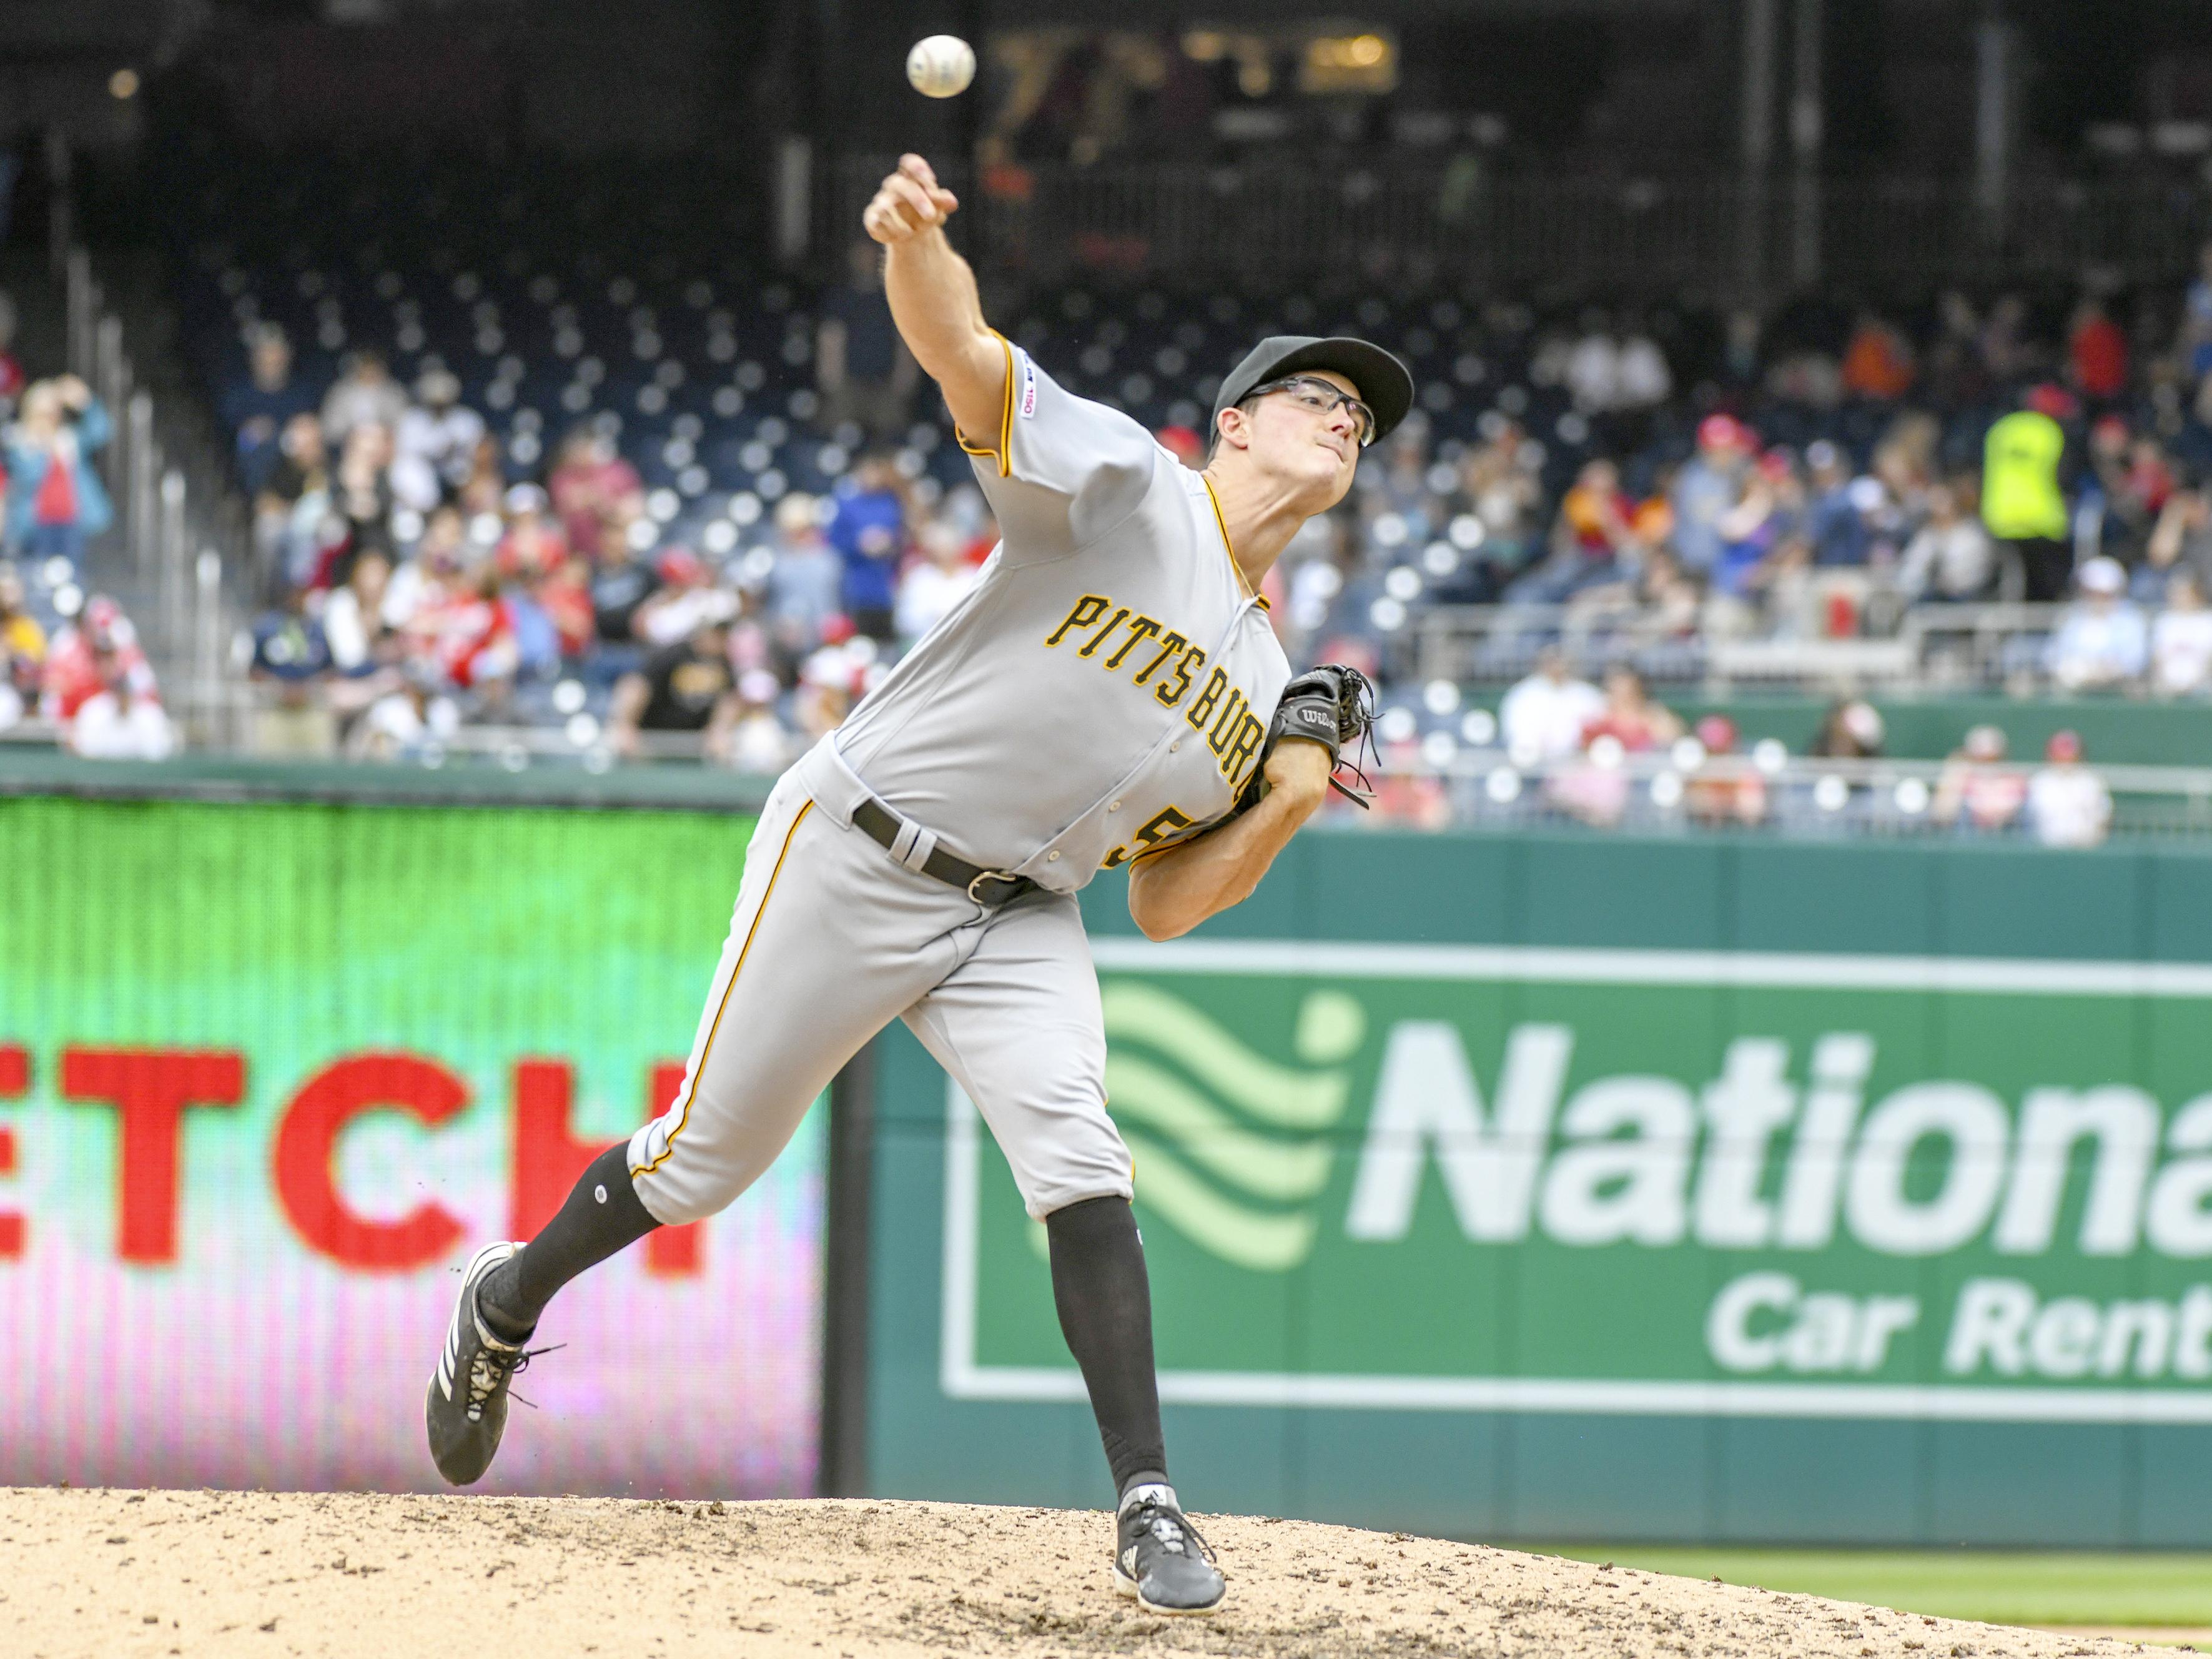 MLB: APR 14 Pirates at Nationals